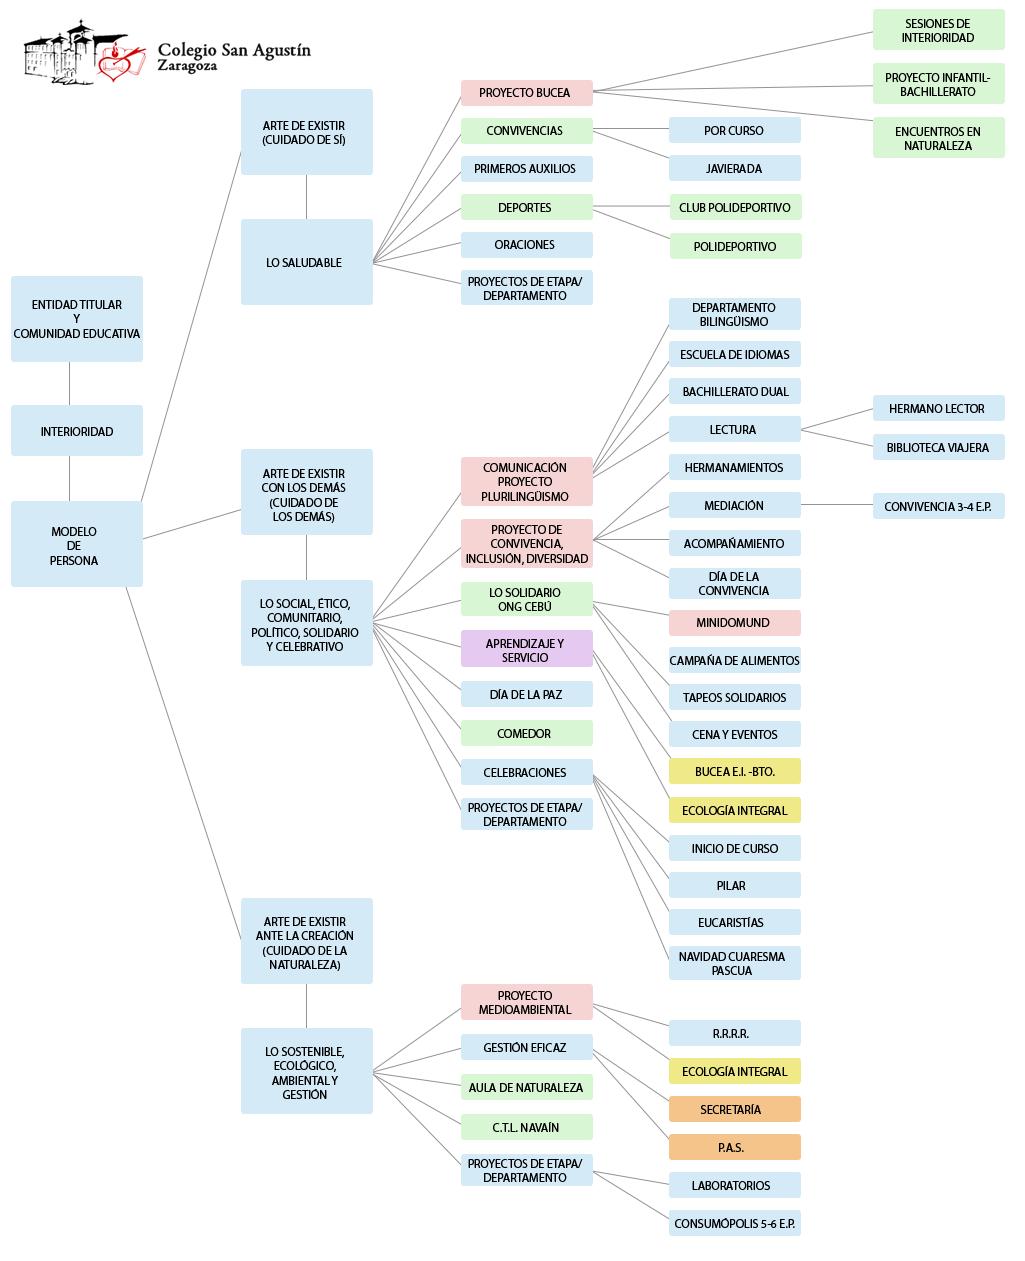 modelo_educativo_paradigma_completo